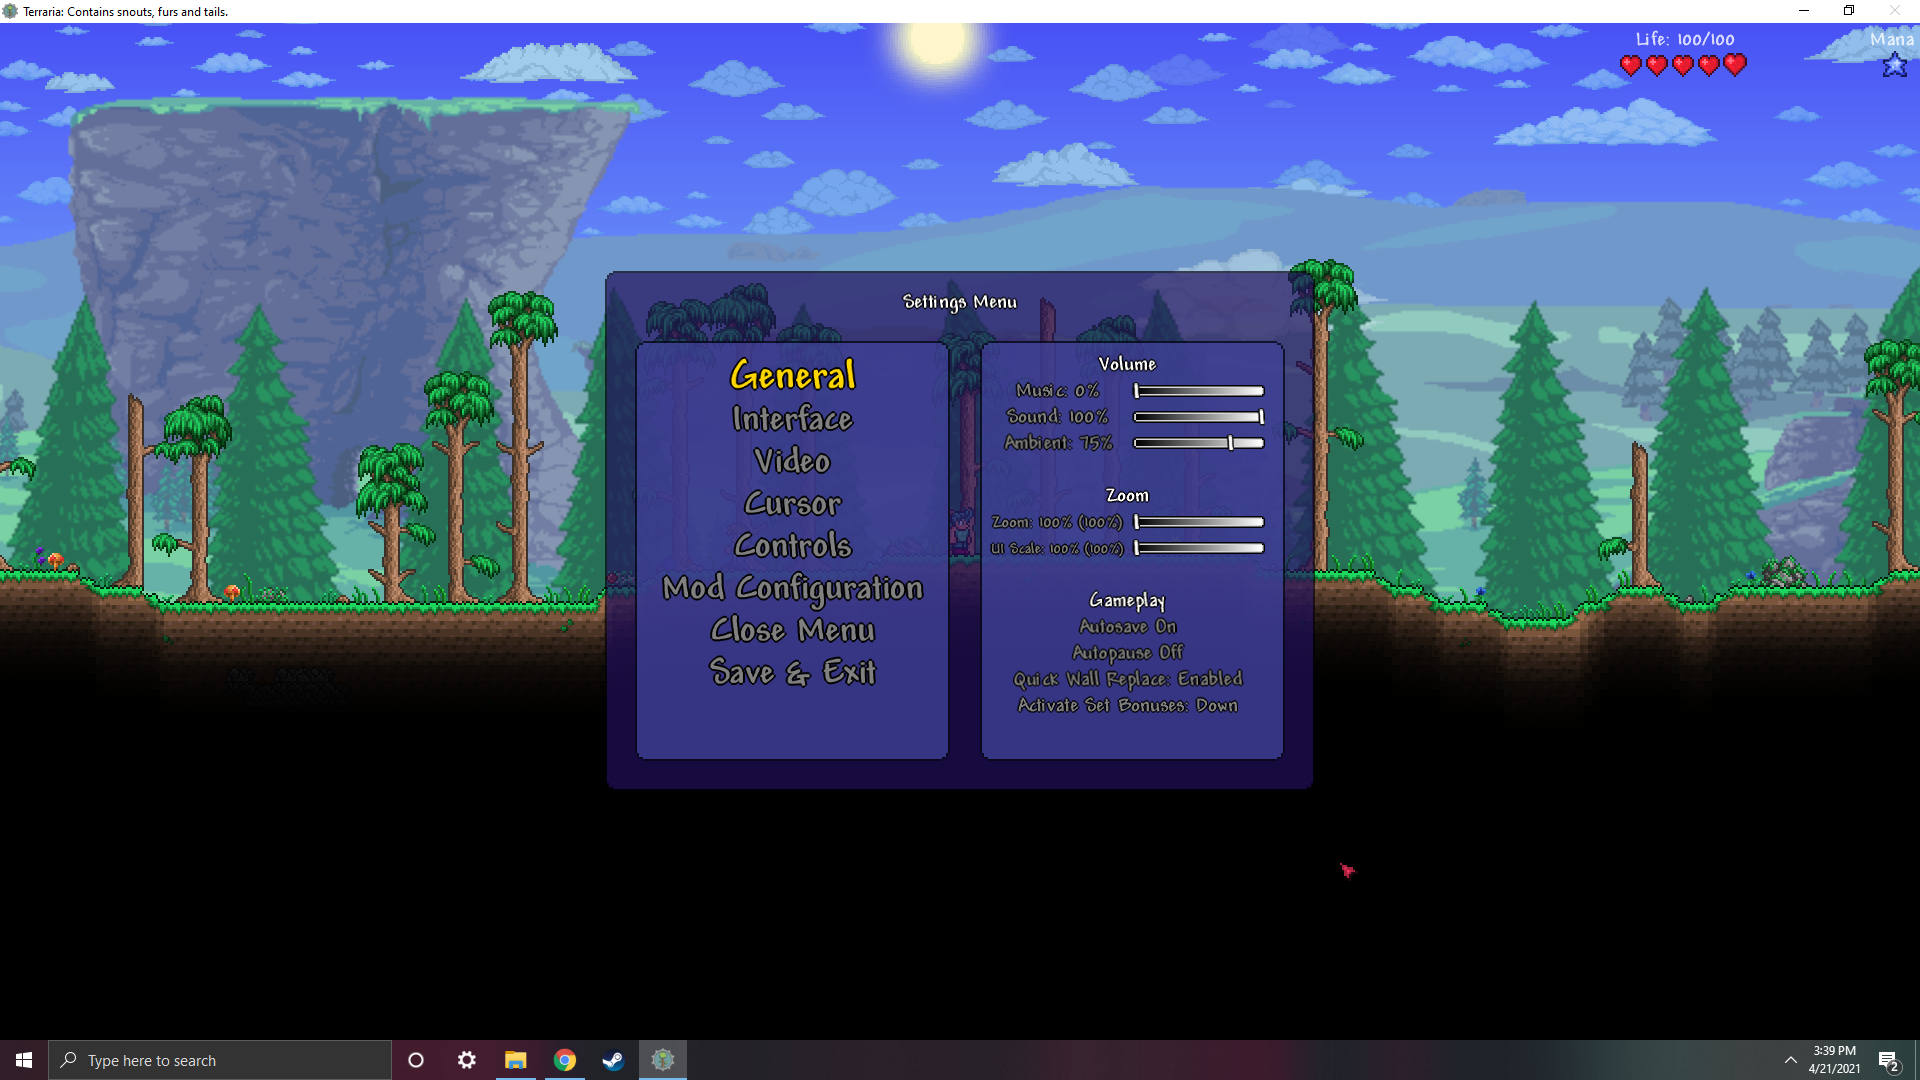 Desktop Screenshot 2021.04.21 - 15.39.10.68.png